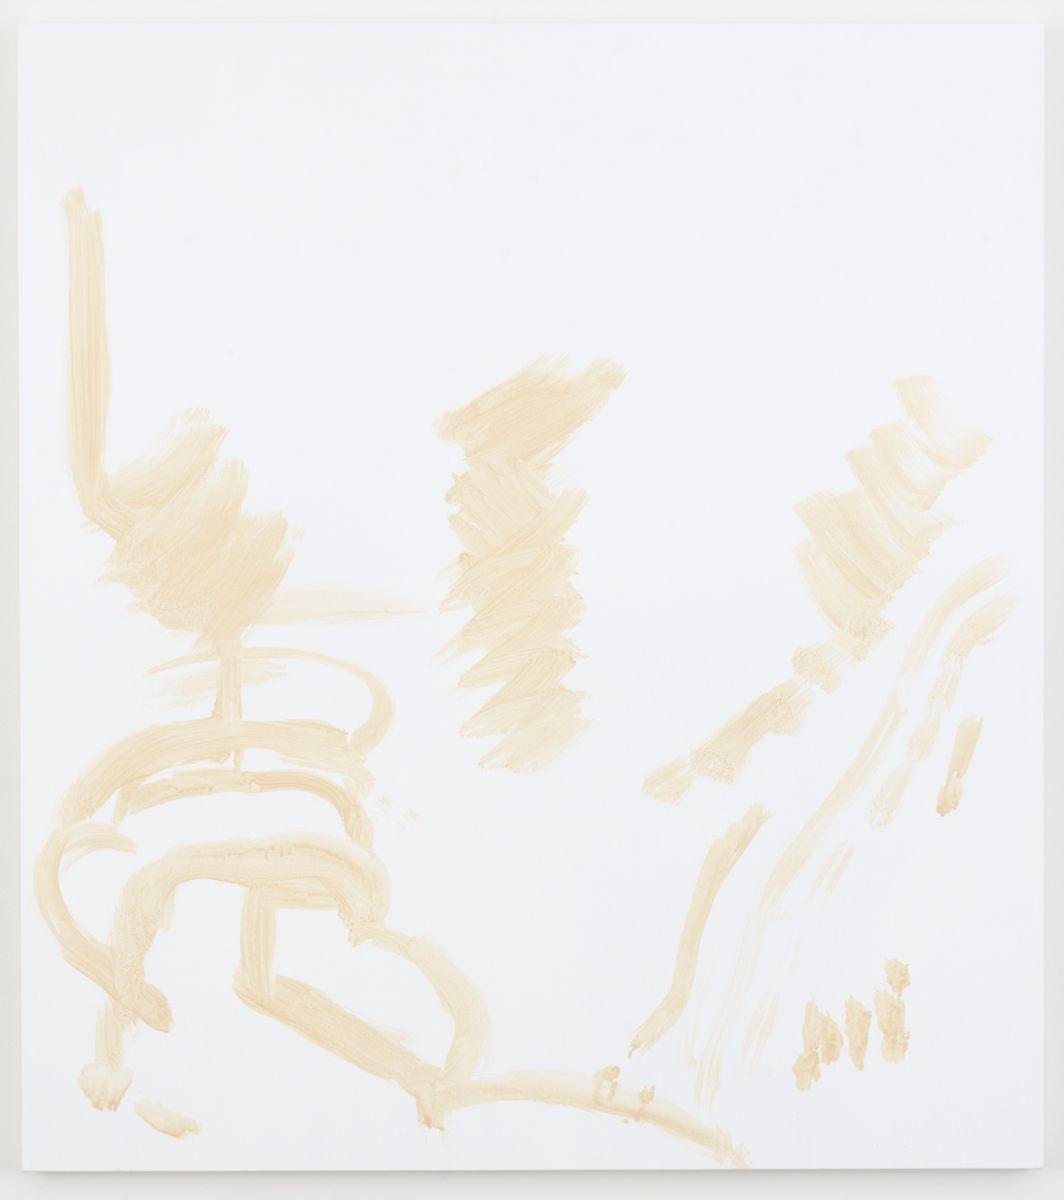 Michael Krebber Herbes de Provence MK.6081, 2018 Acrylic on canvas 44 3/4 x 40 inches (113.7 x 101.6 cm)